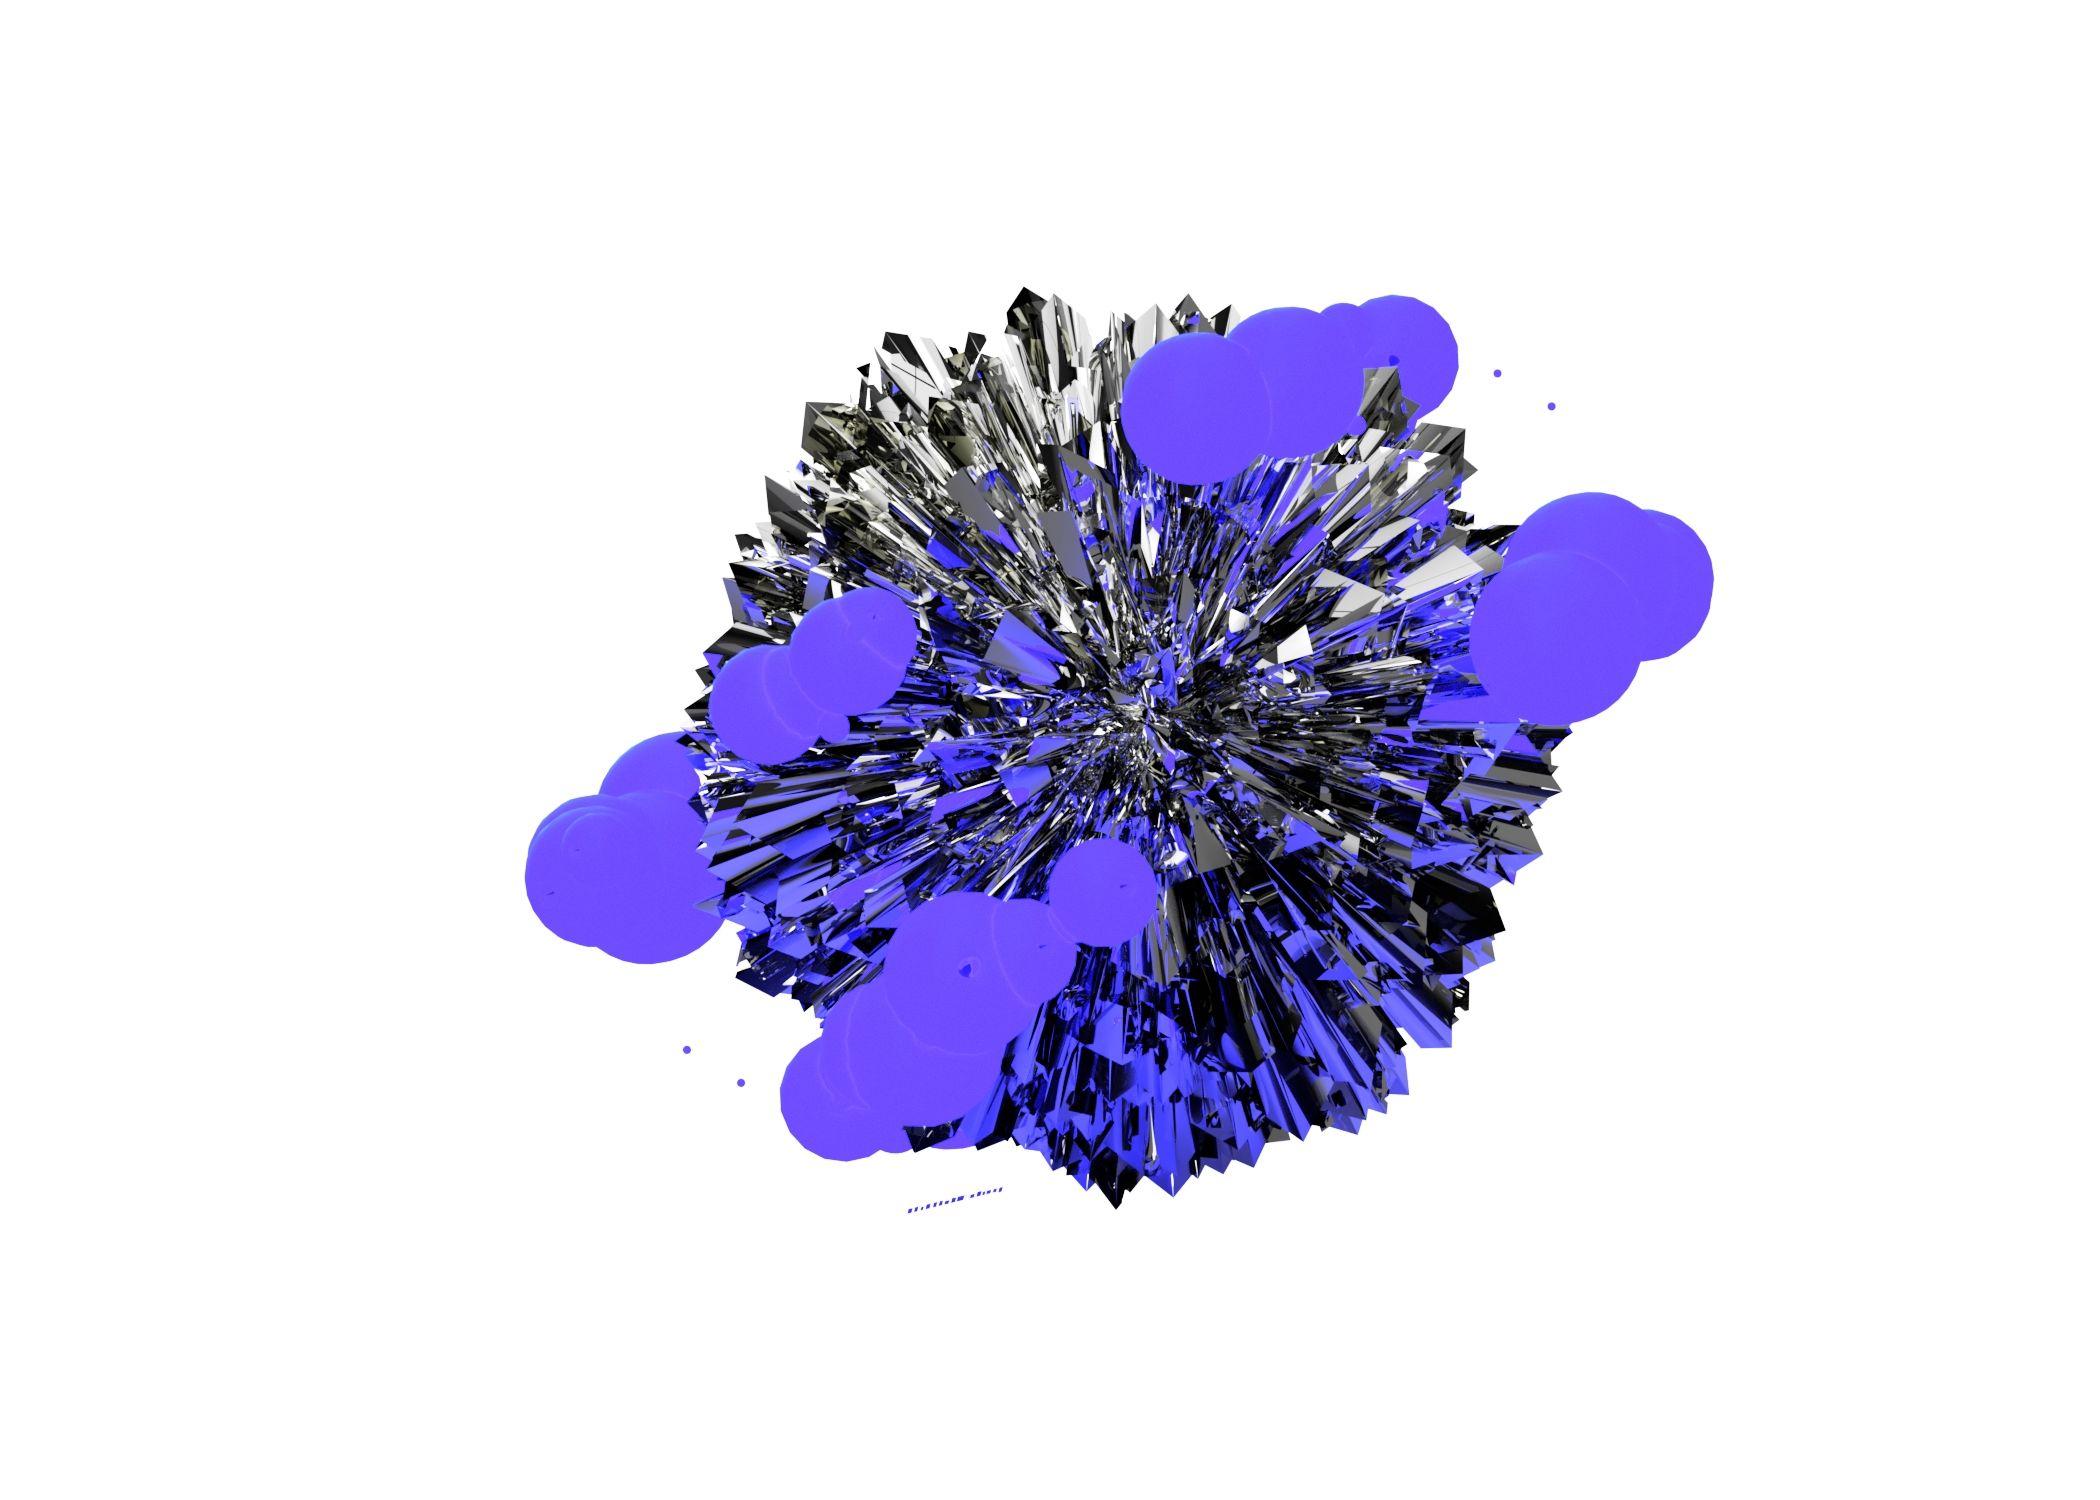 Raasrendering-3e48224c-c361-4910-a967-693b61b28884-3500-3500